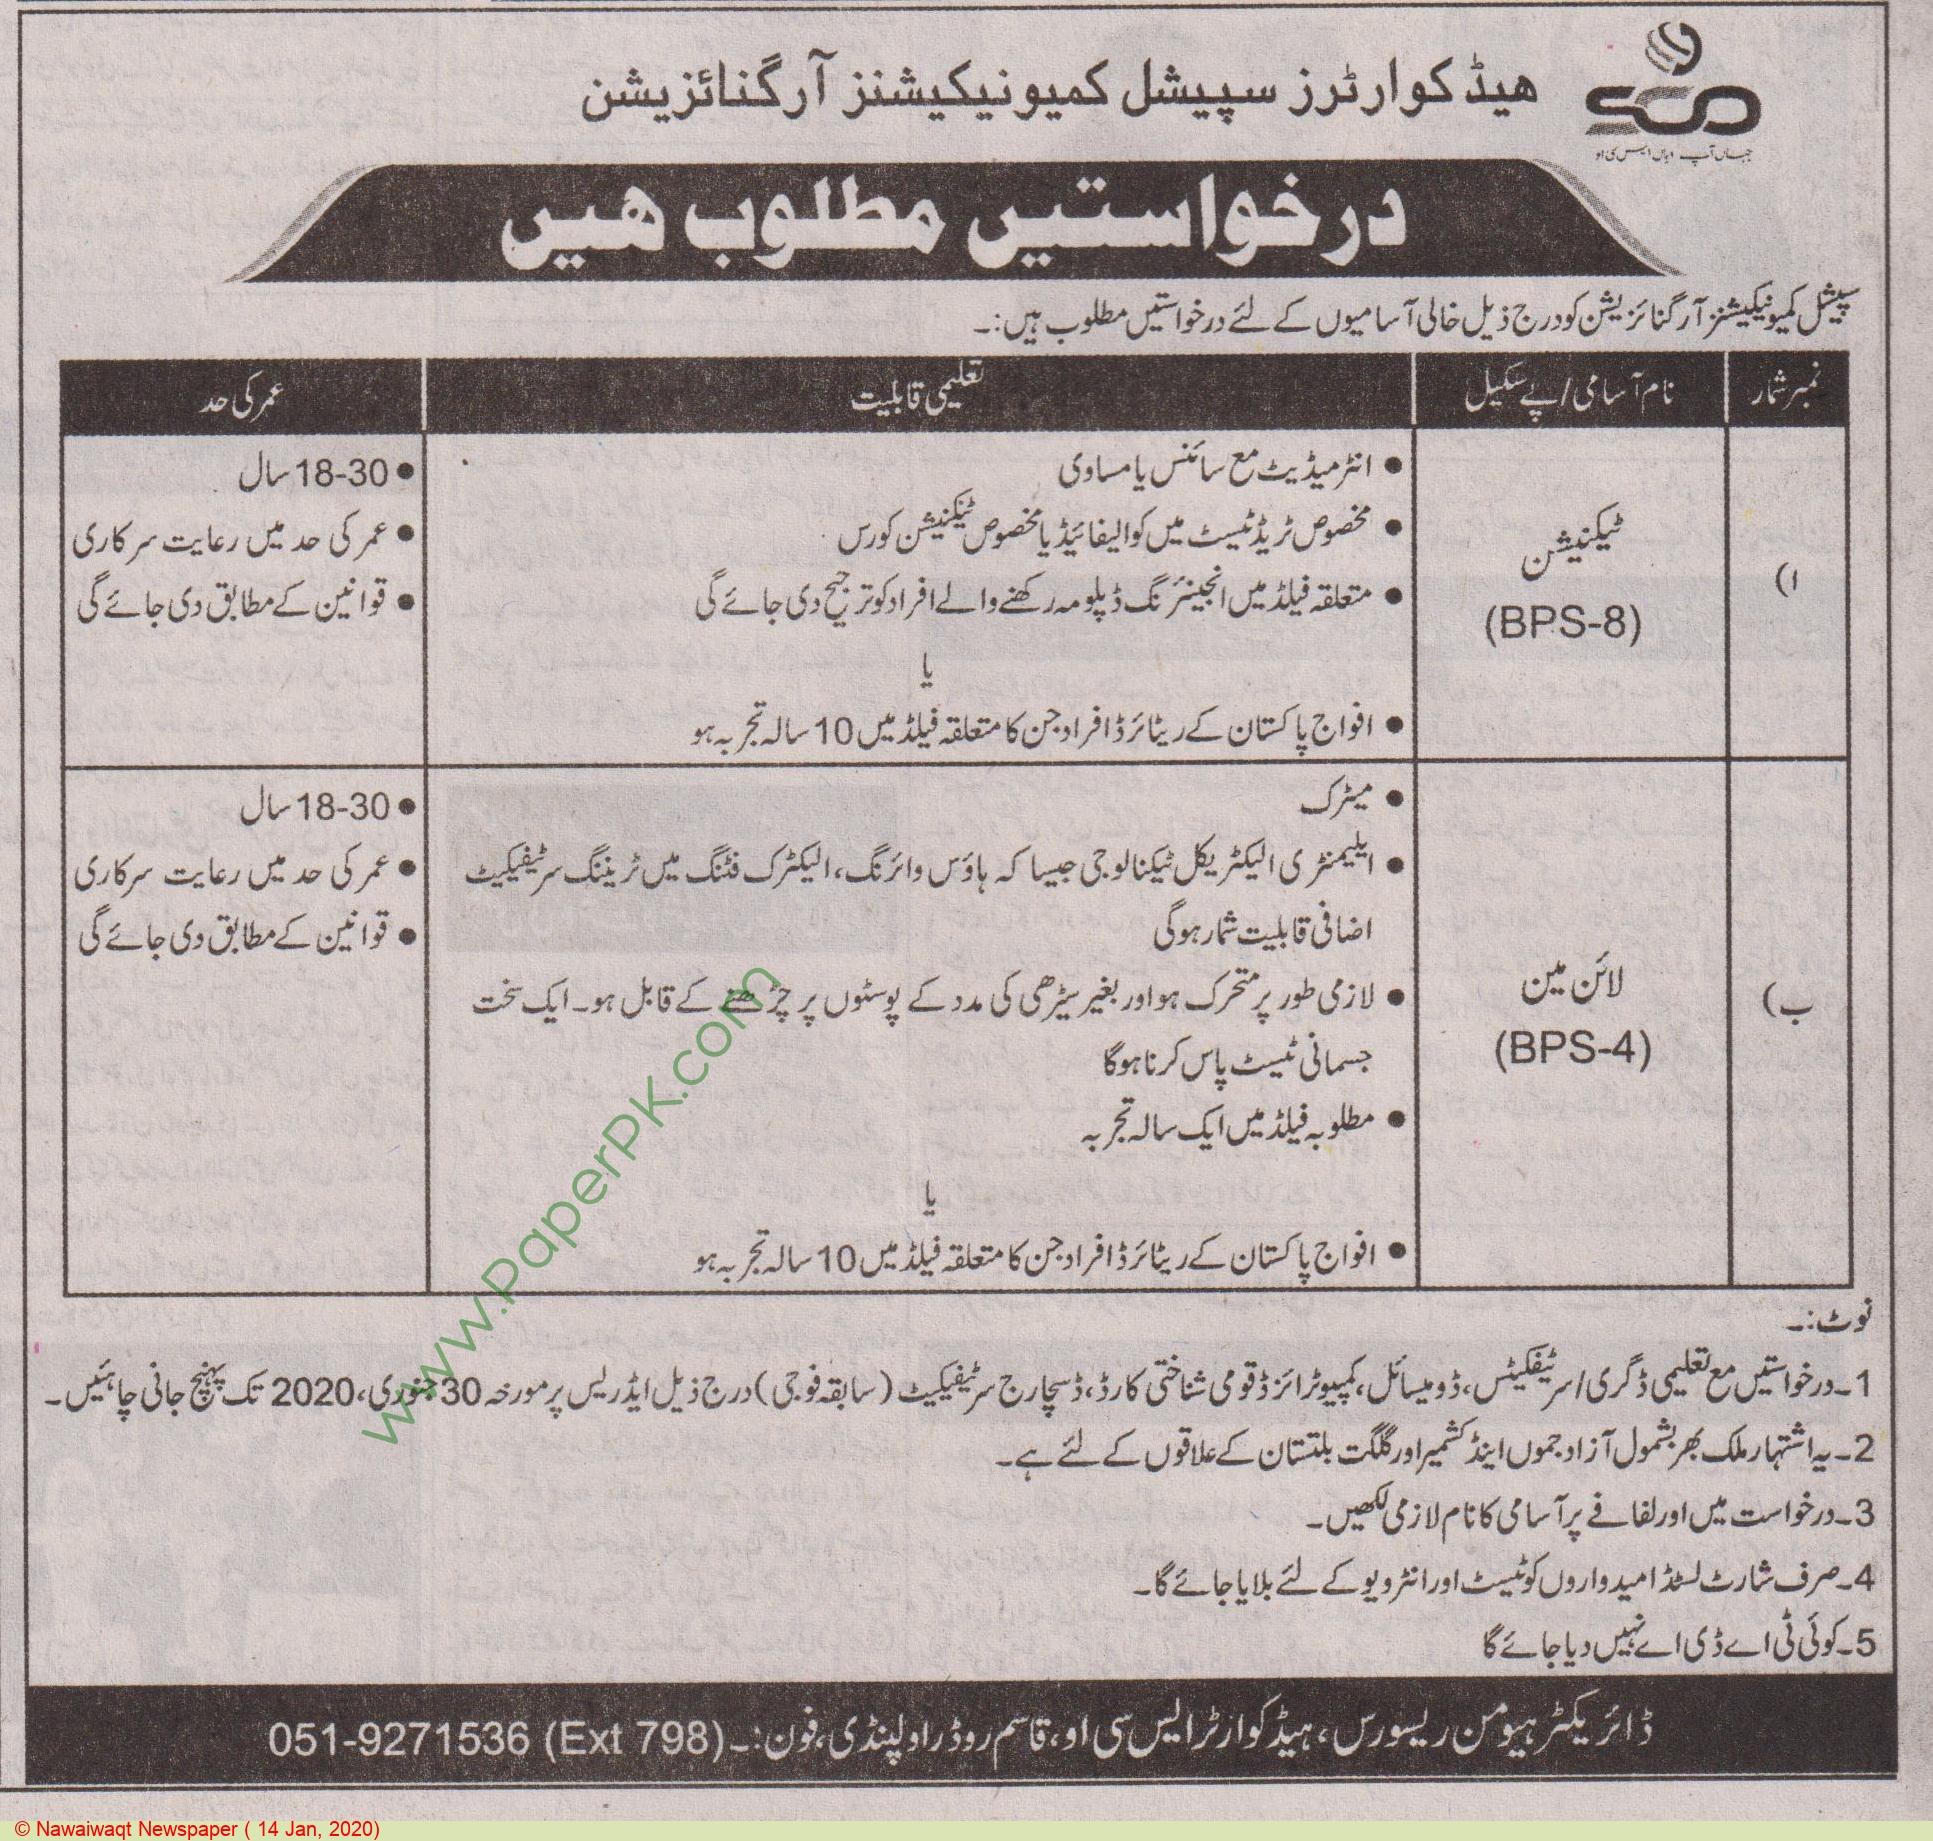 Special Communications Organization jobs newspaper ad for Technician in Rawalpindi